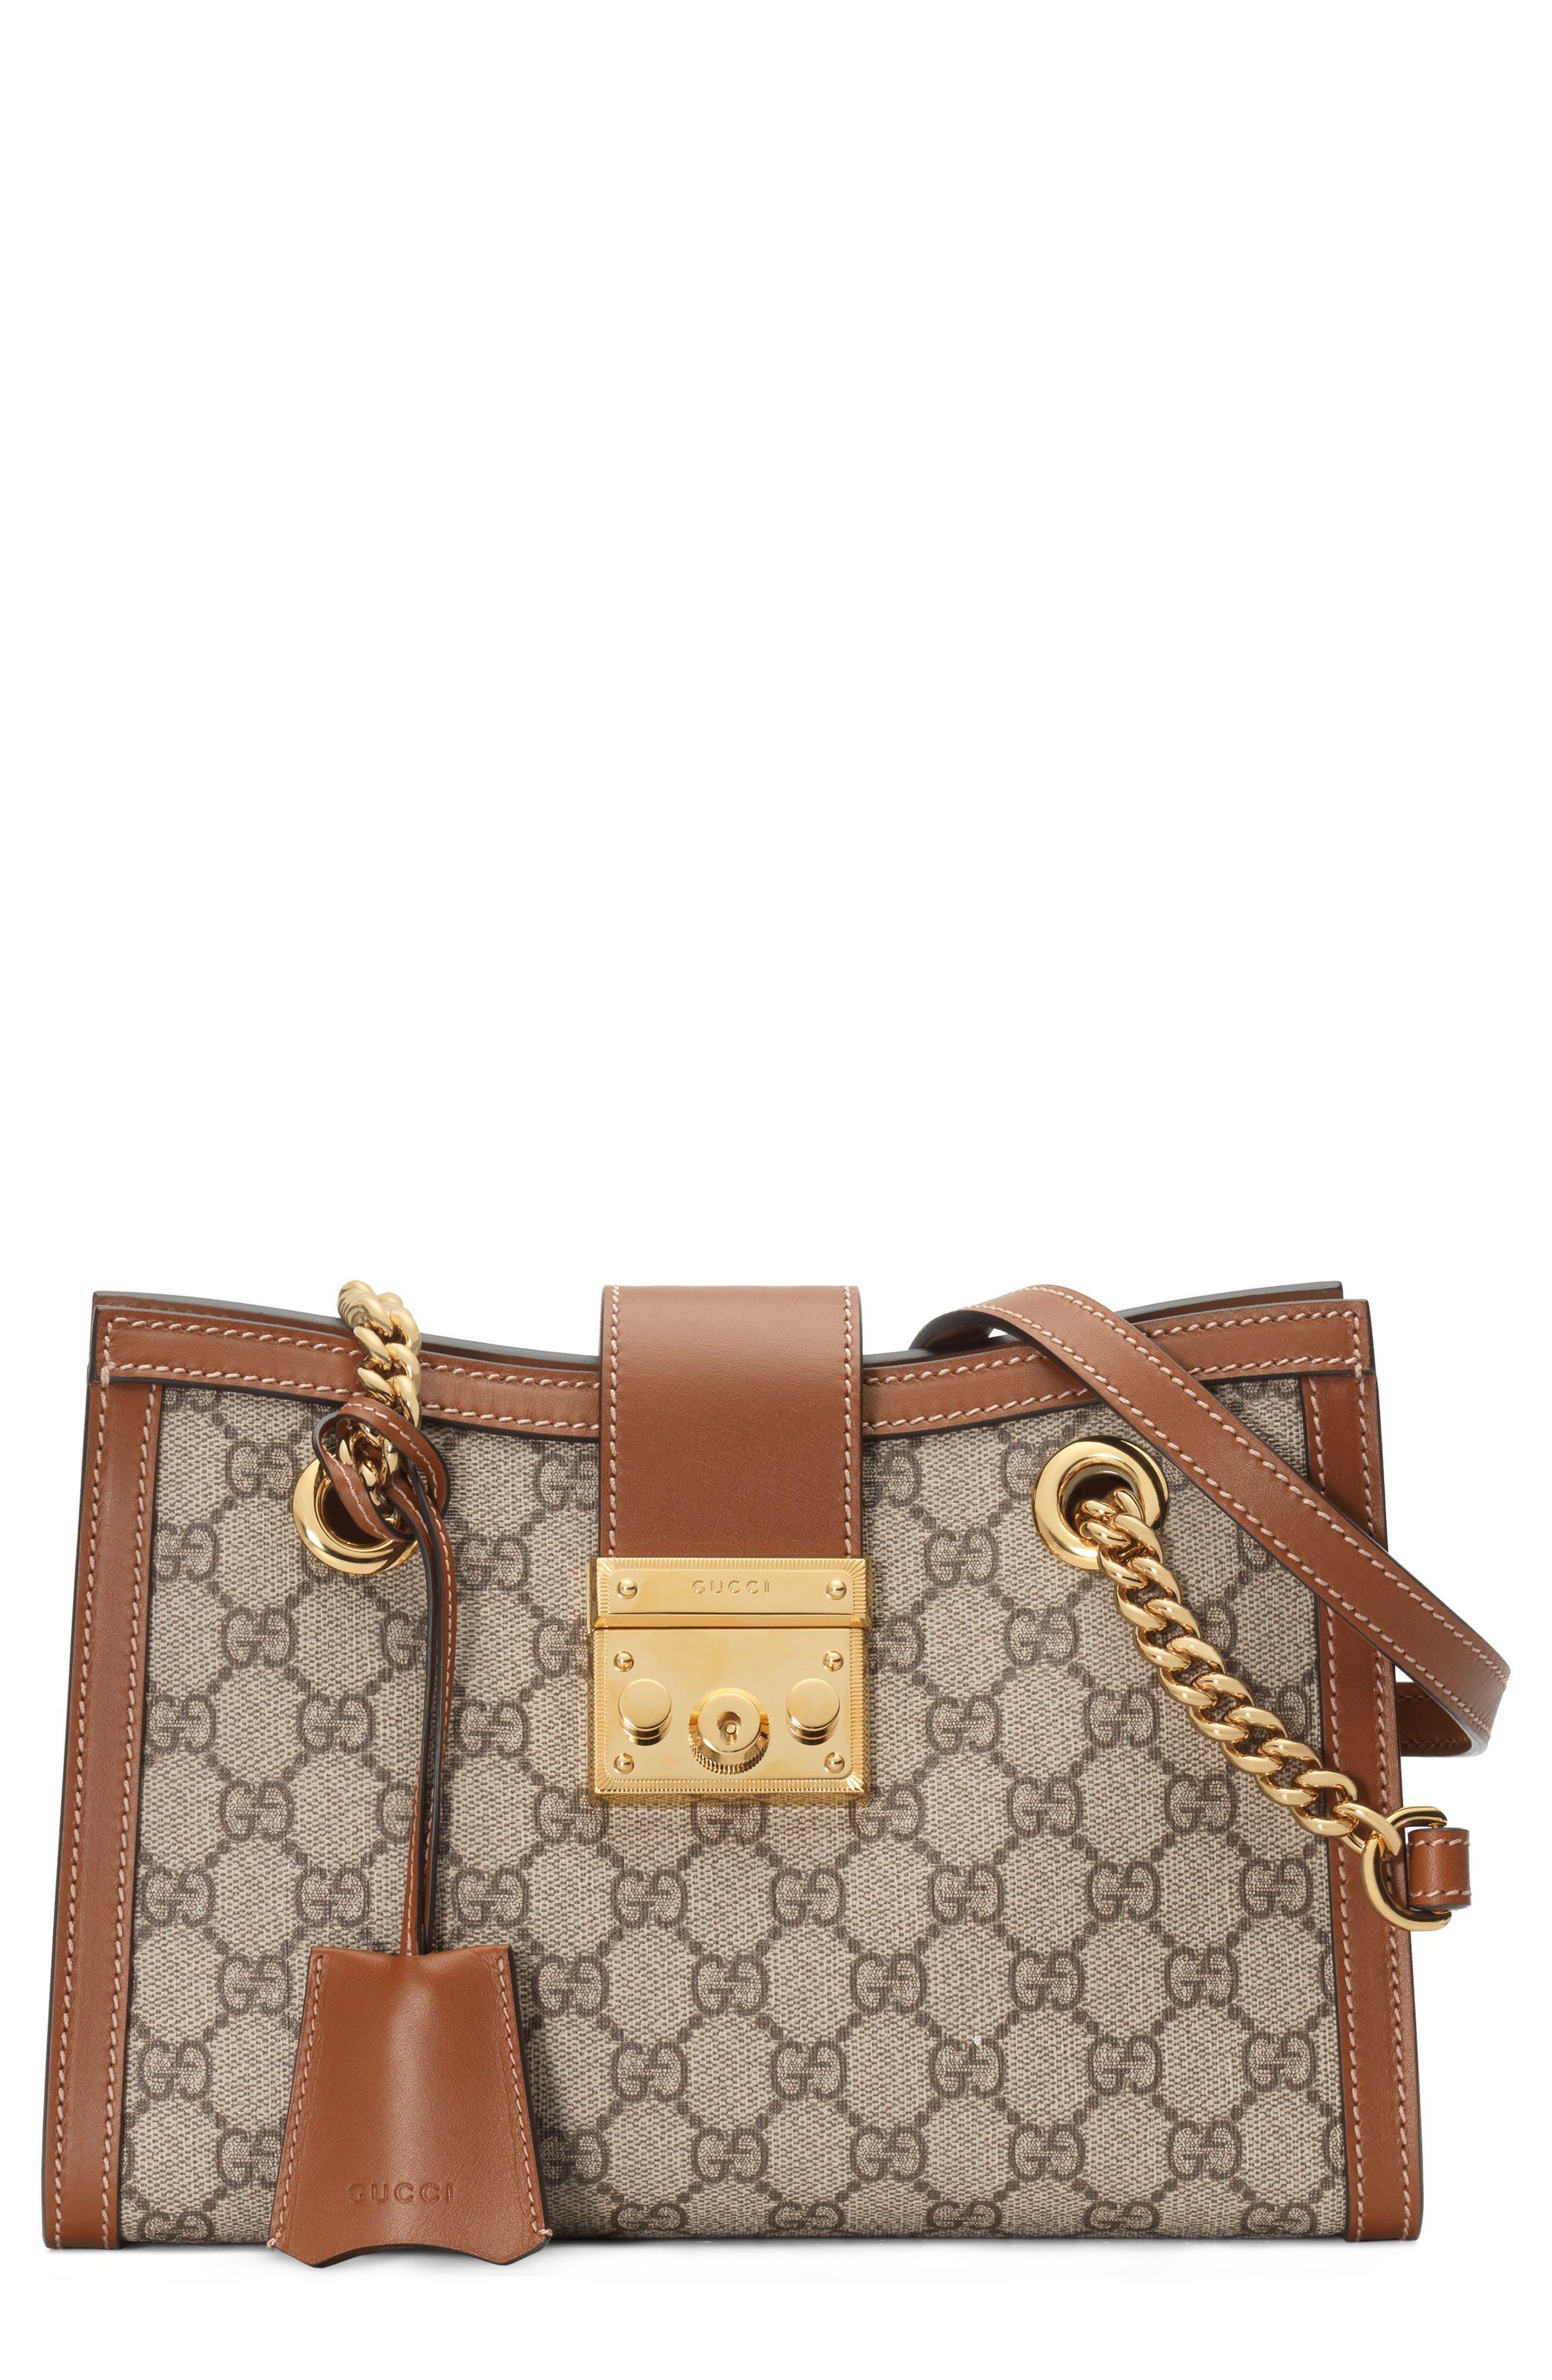 GUCCI Small Padlock GG Supreme Shoulder Bag, Main, color, BEIGE EBONY/ TUSCANY